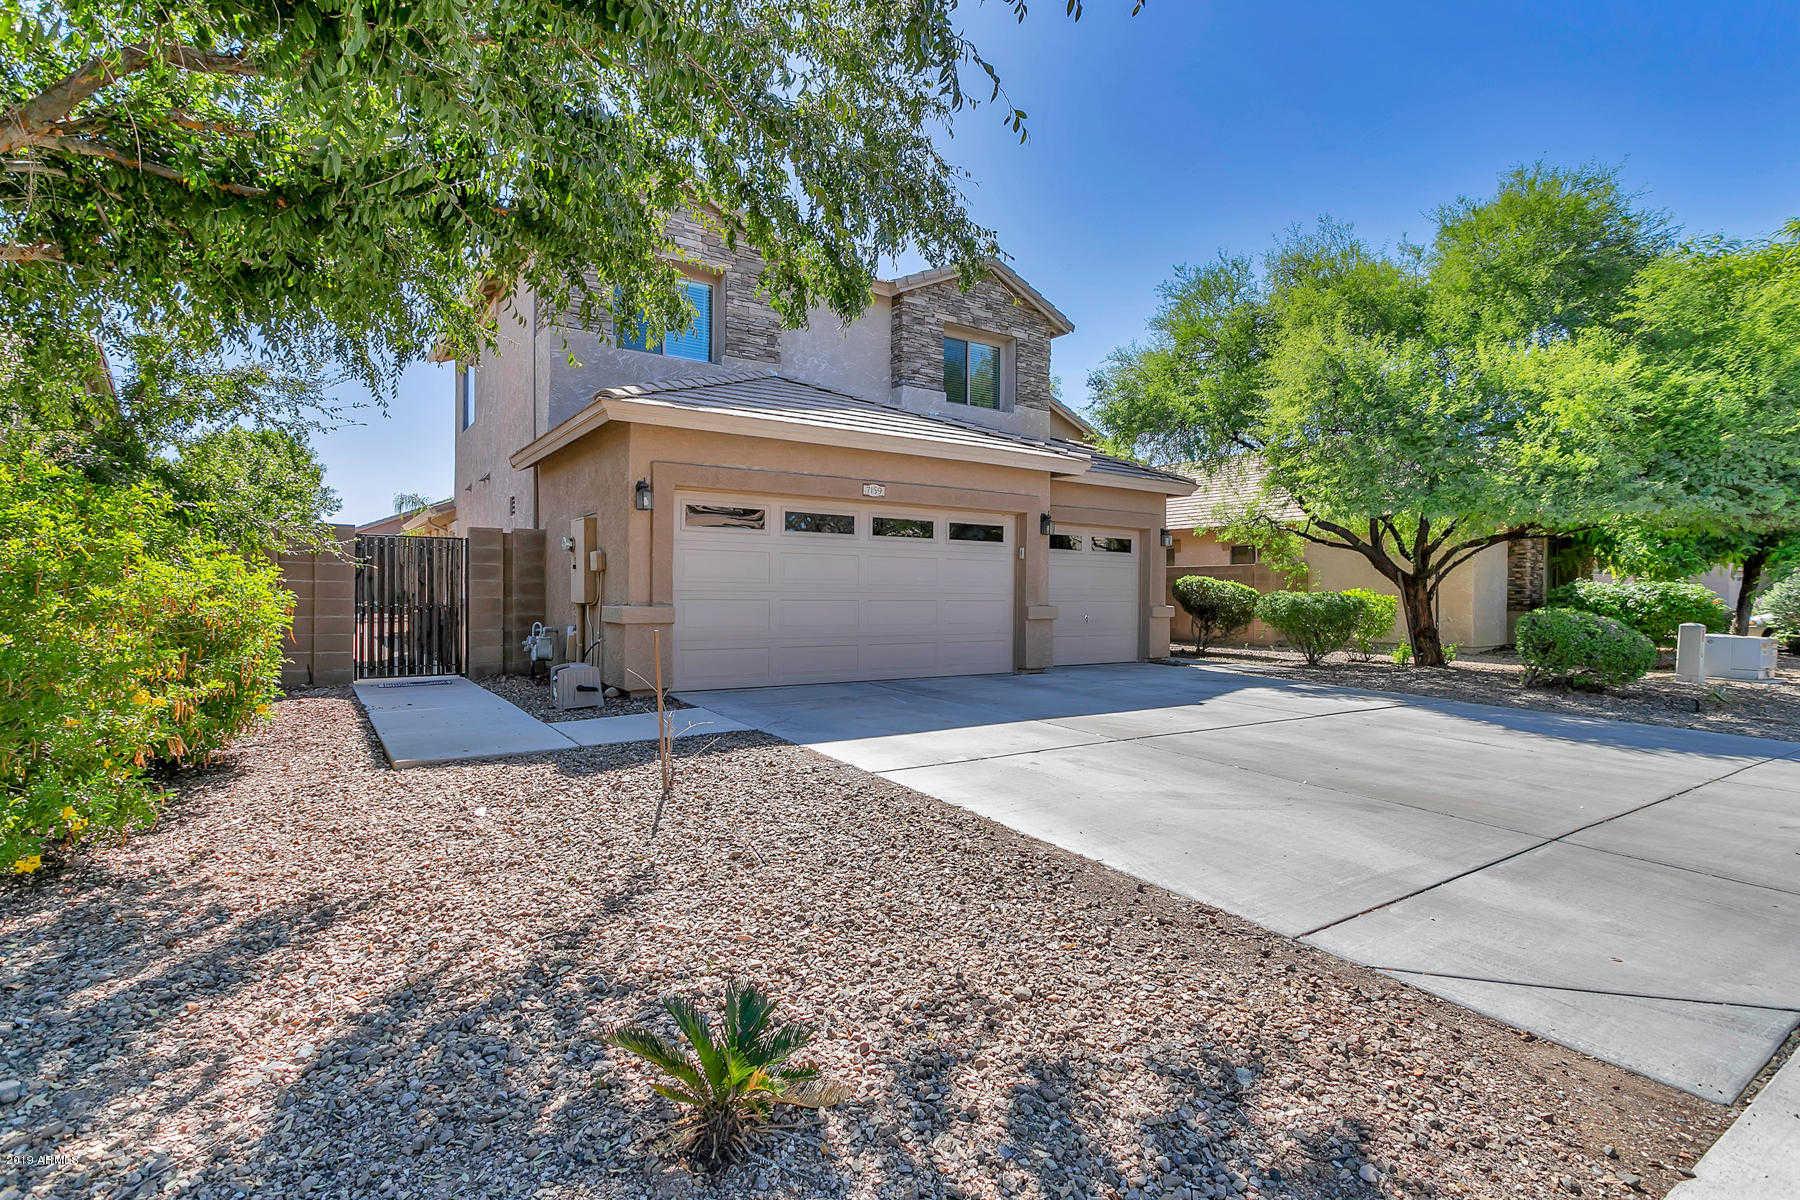 $329,900 - 4Br/3Ba - Home for Sale in Morningstar Estates, Glendale